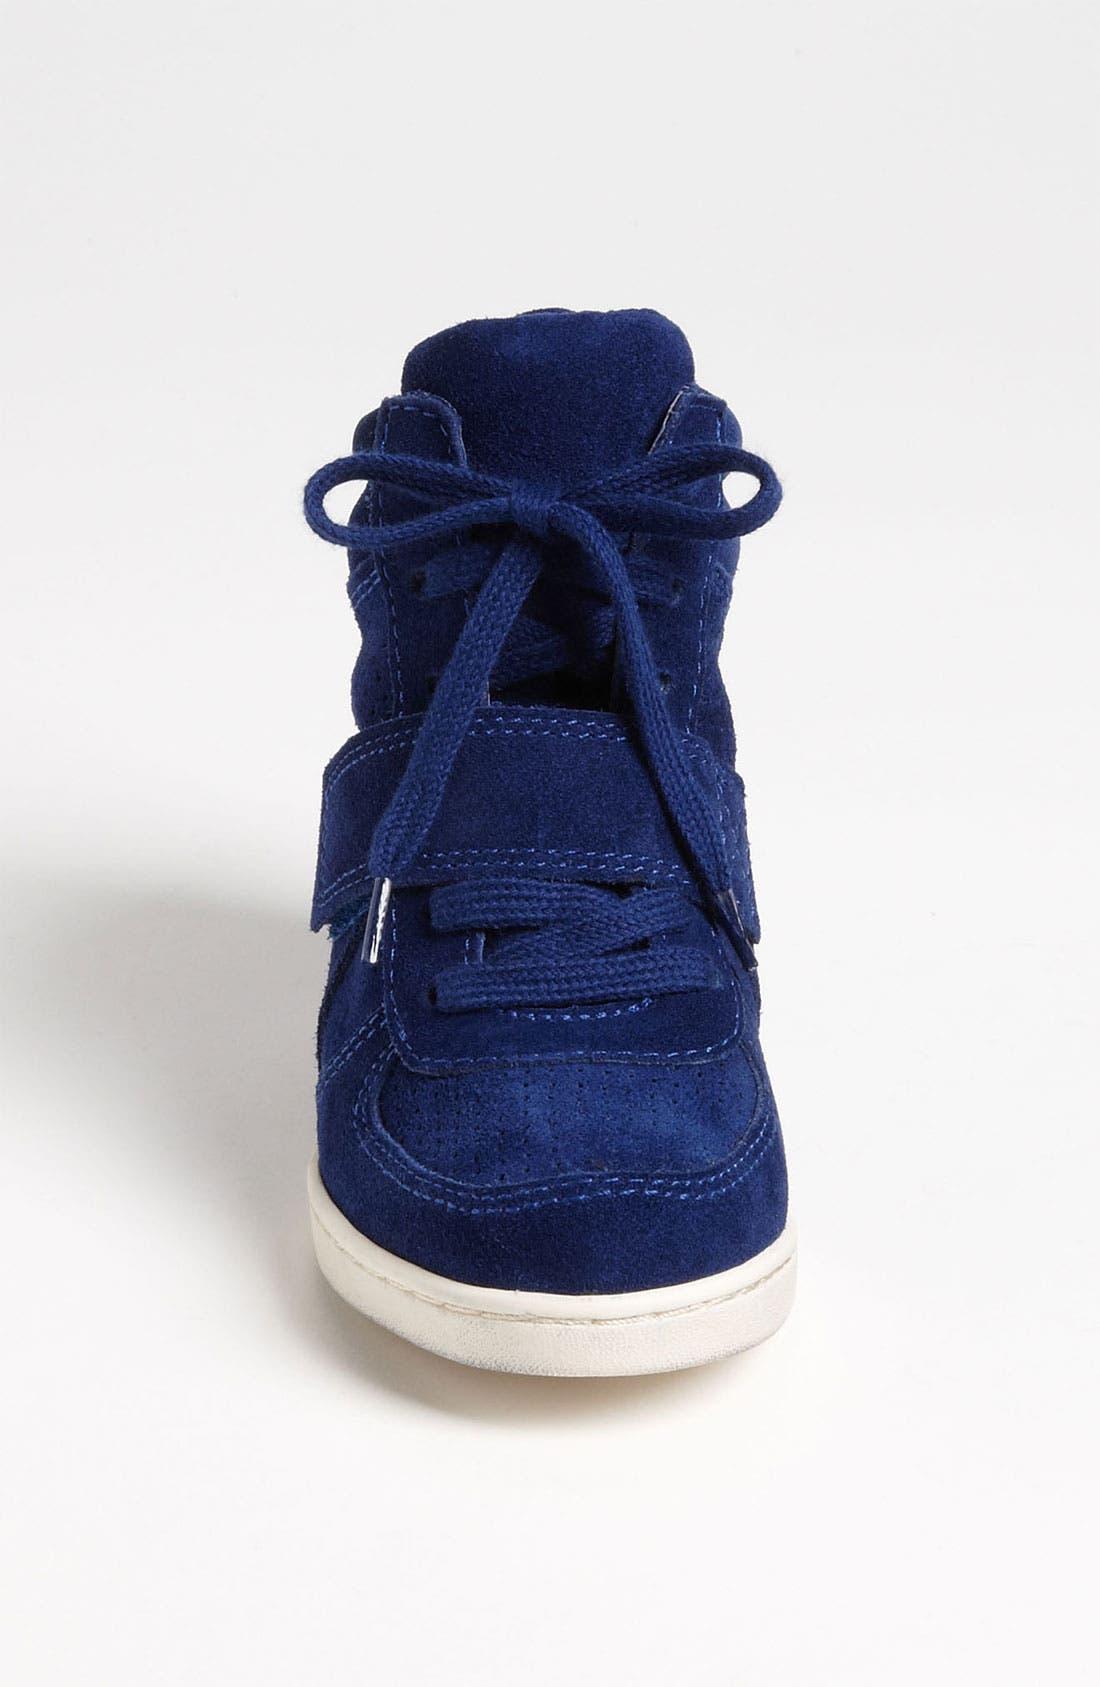 Alternate Image 3  - Ash 'Babe' Sneaker (Toddler, Little Kid & Big Kid)